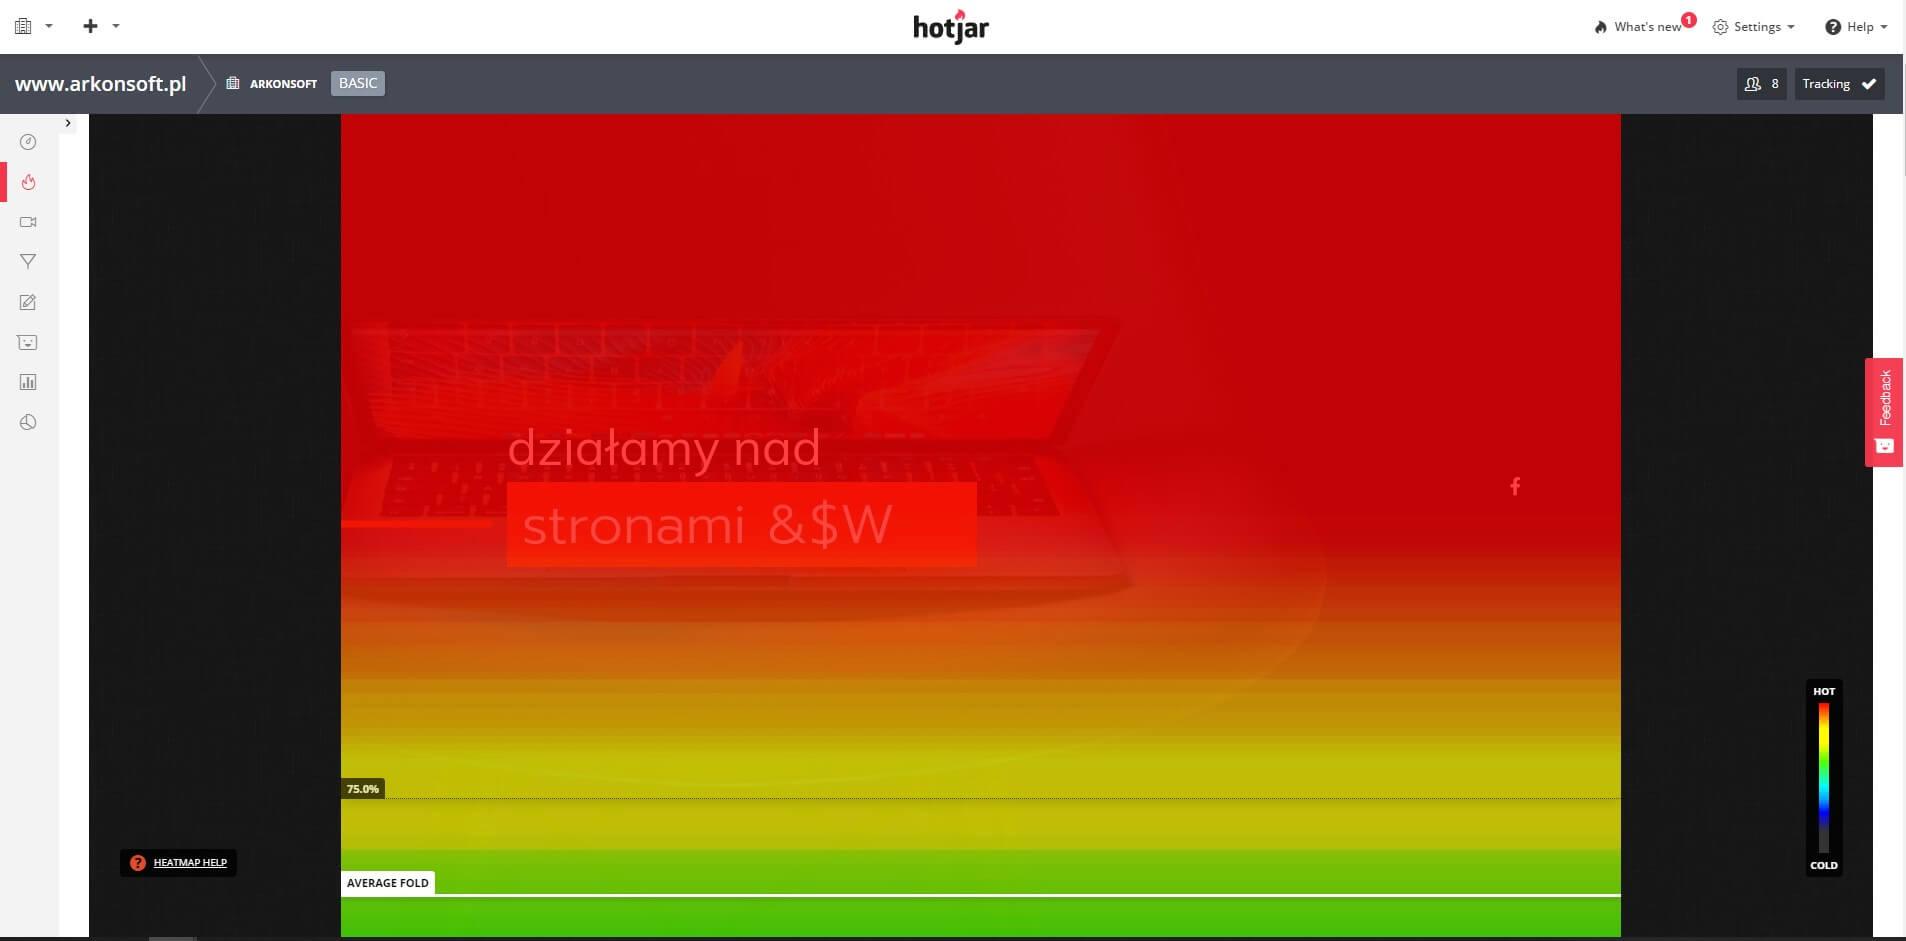 Heatmapa zprogramu Hotjar.